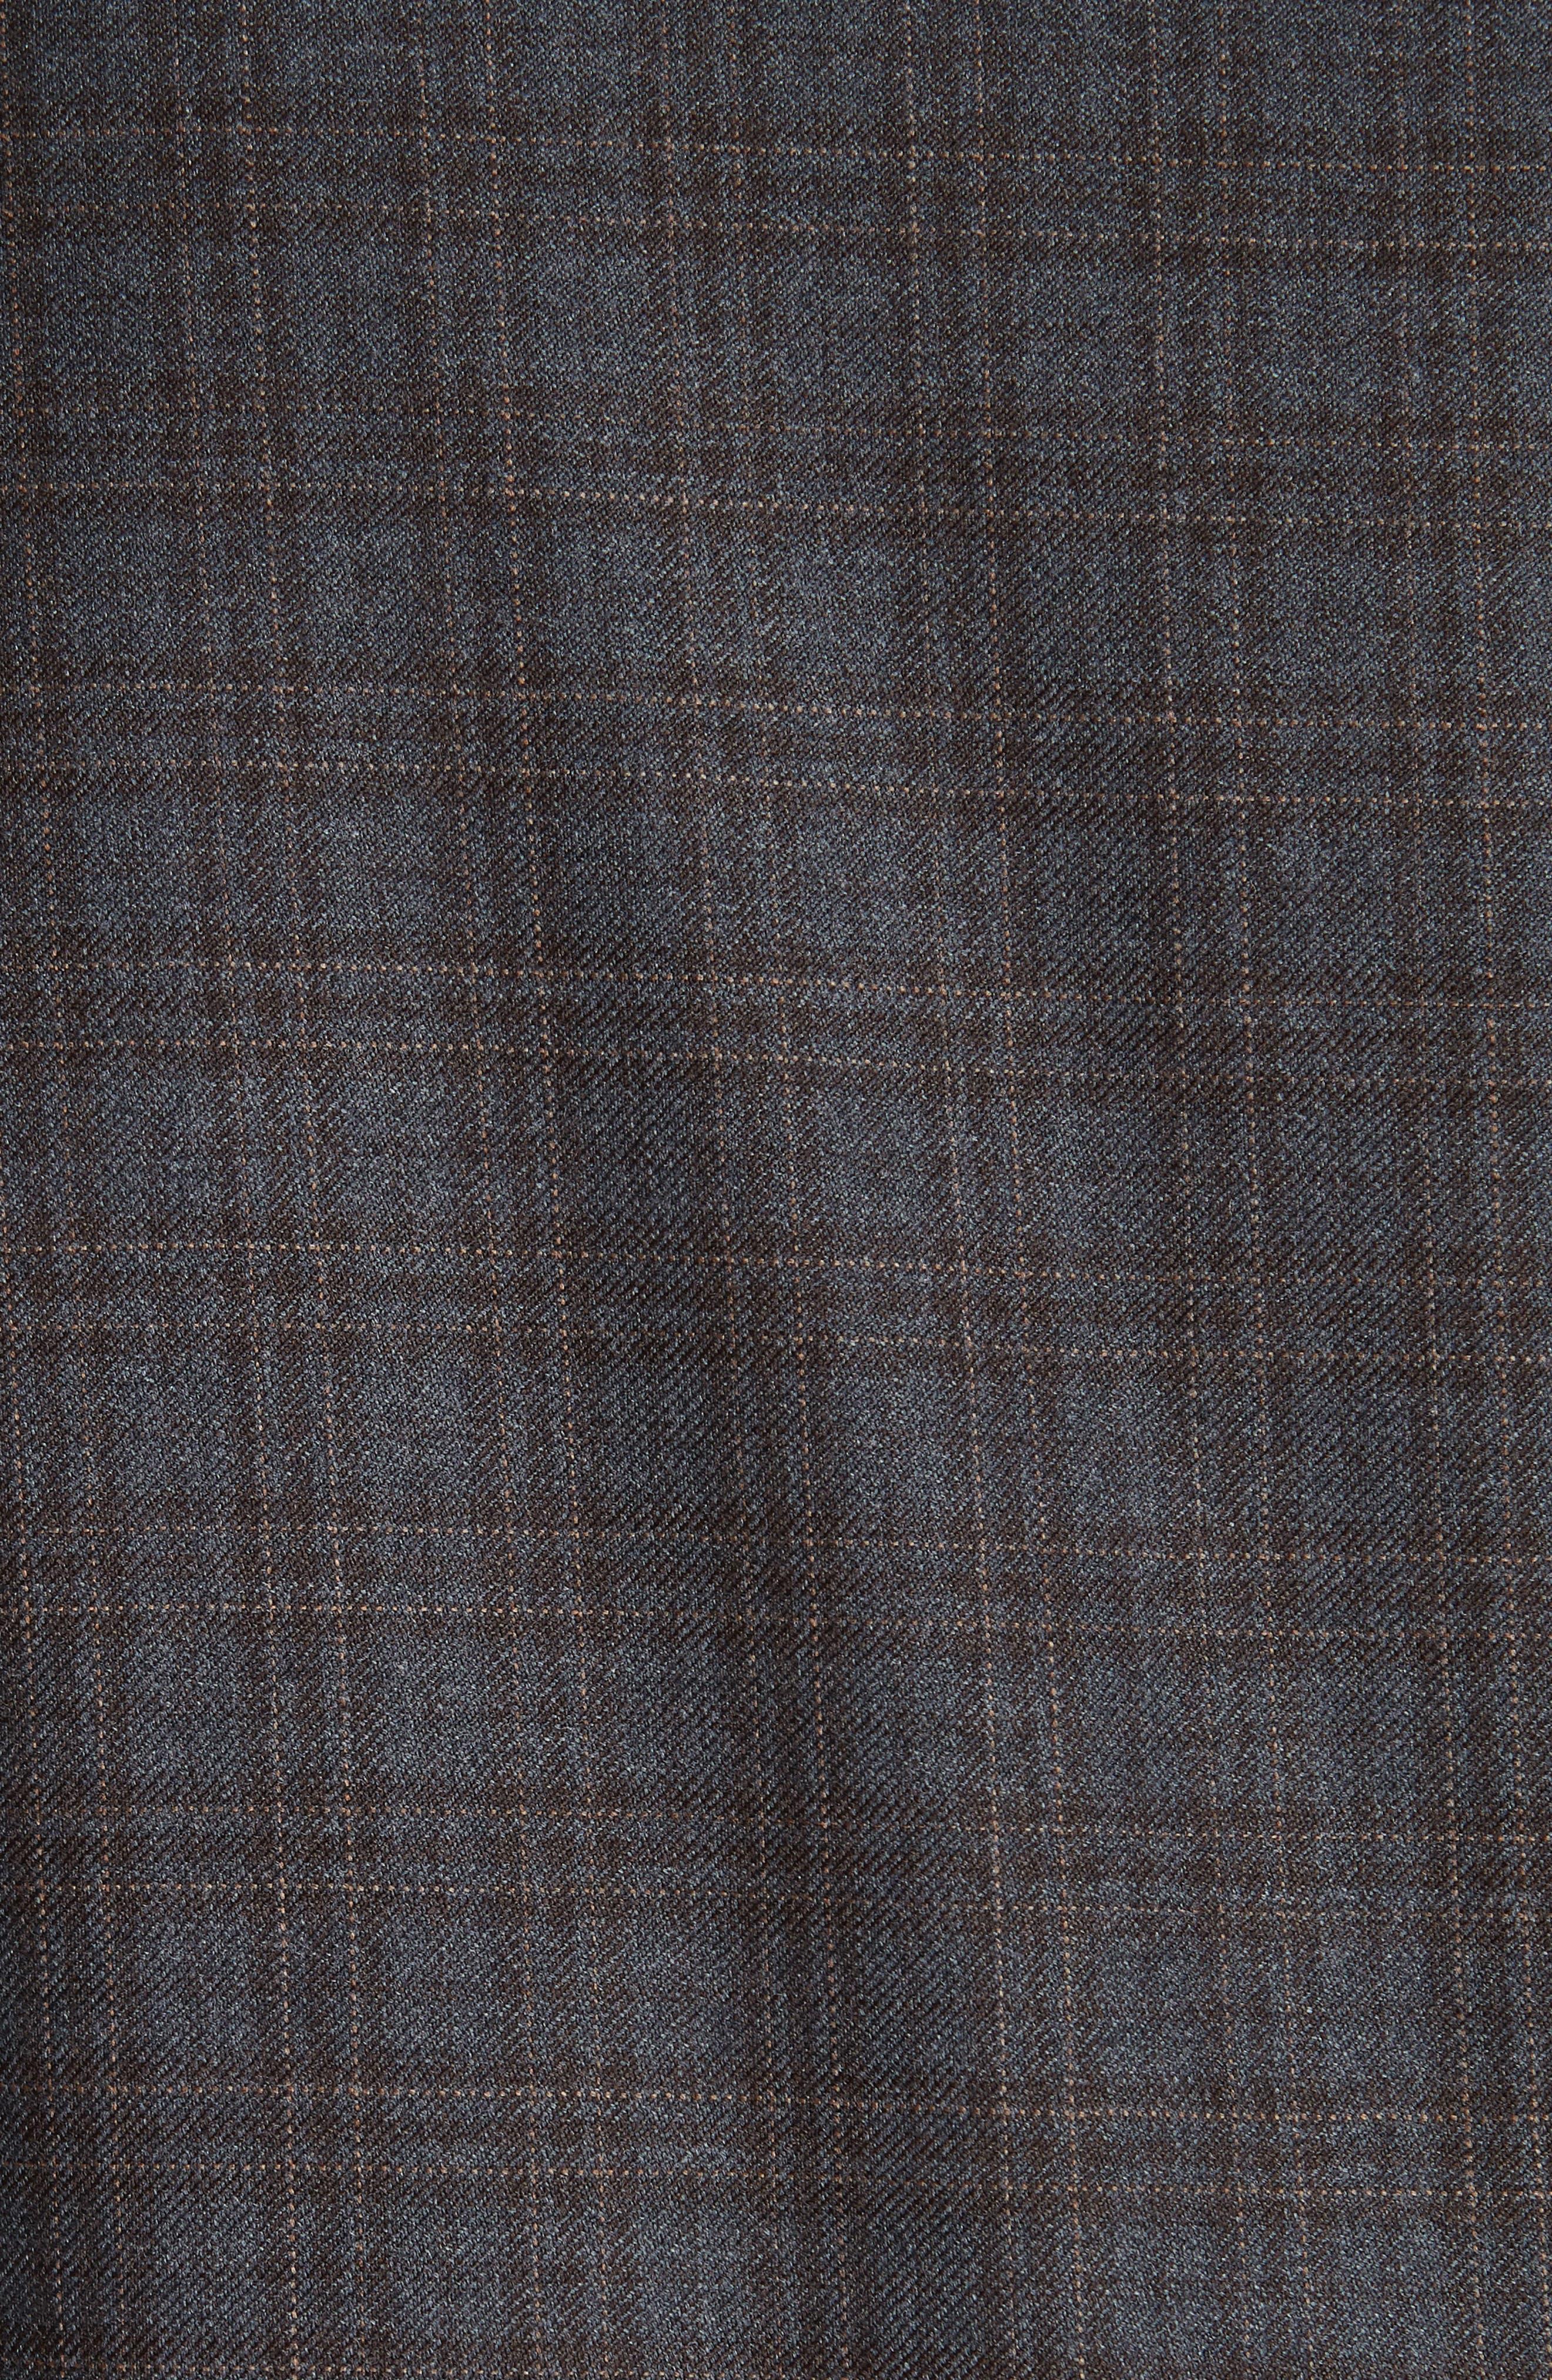 Classic Fit Plaid Wool Sport Coat,                             Alternate thumbnail 6, color,                             GREY/ BROWN